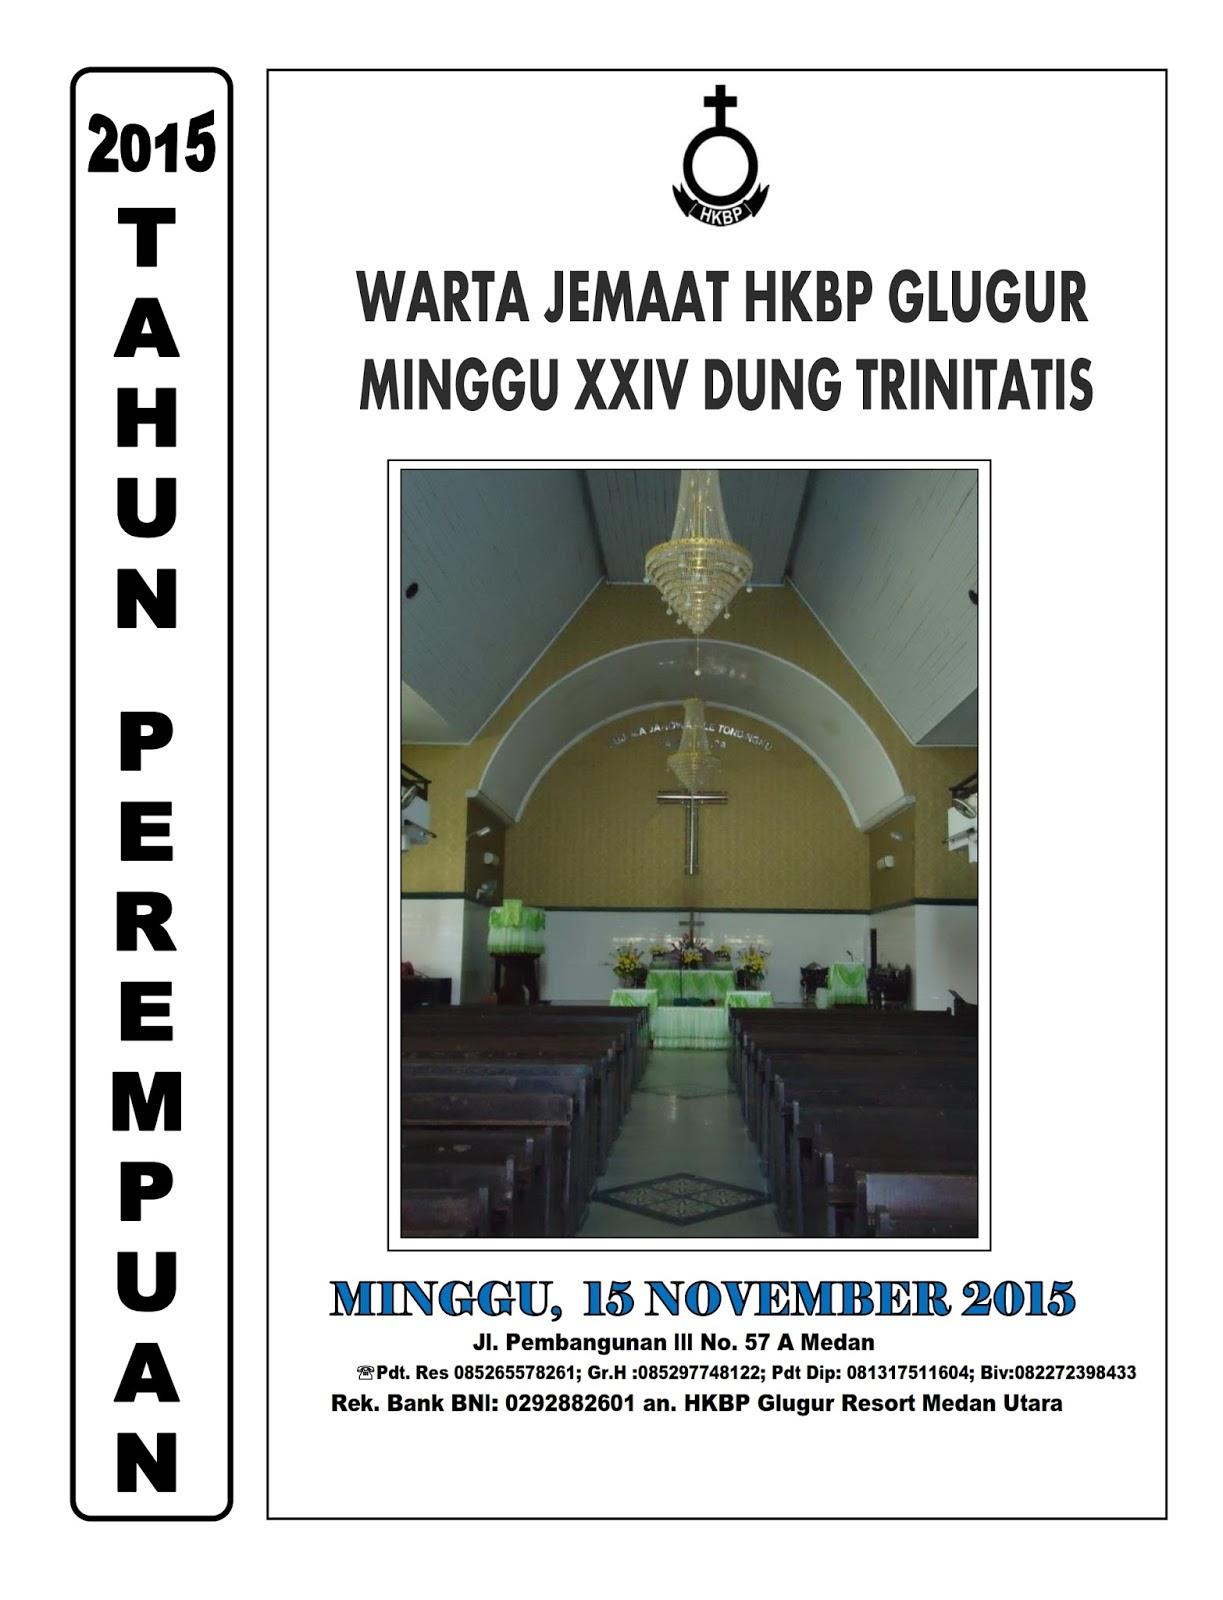 Warta Jemaat 15 November 2015